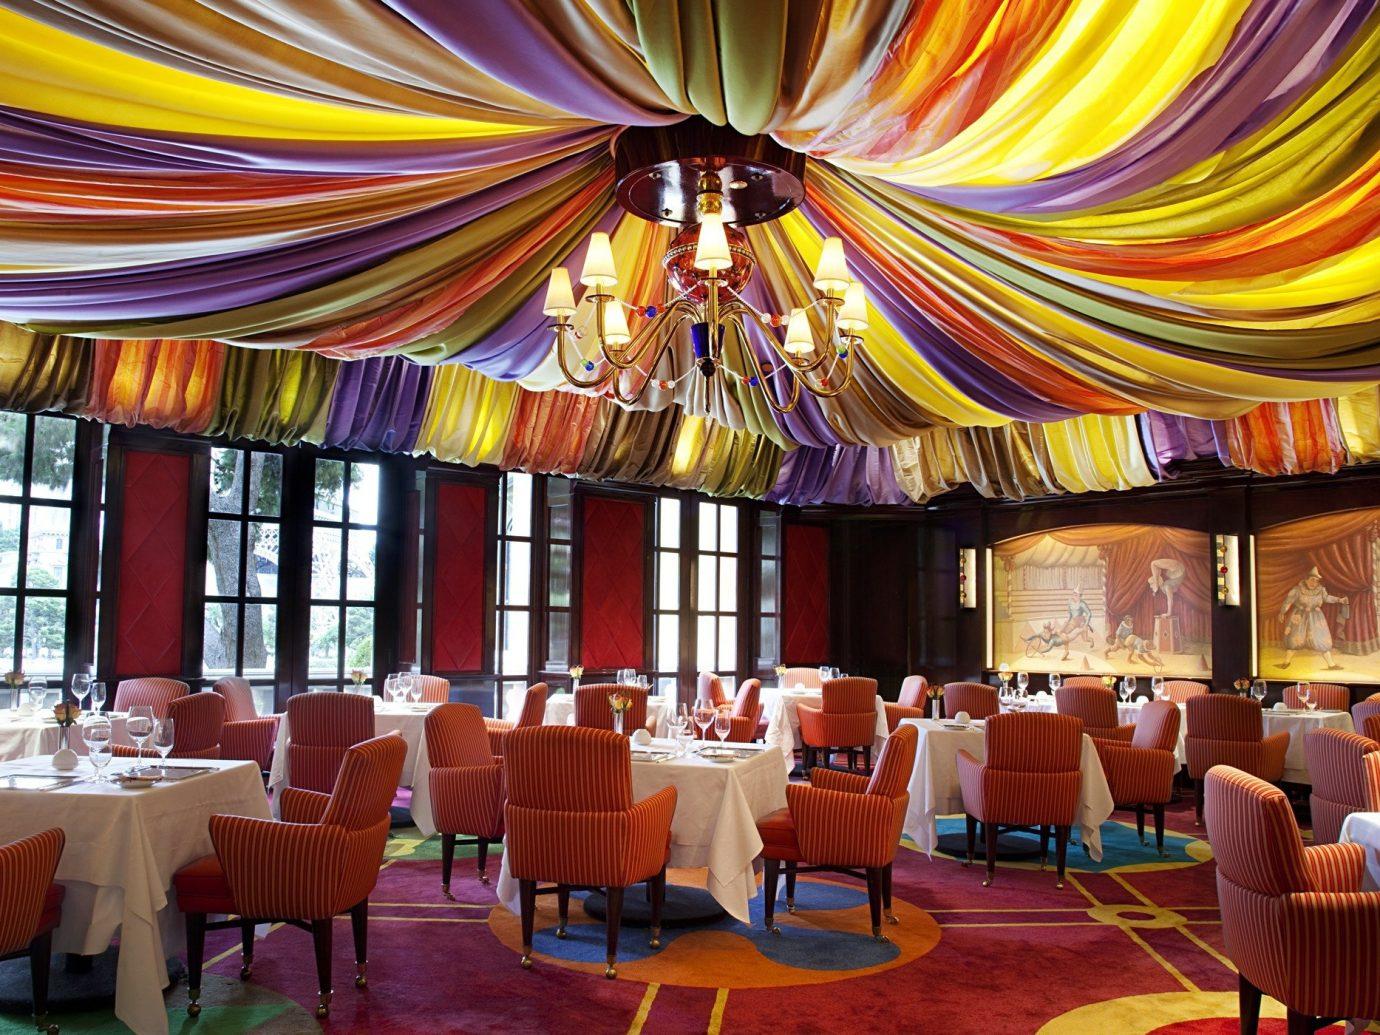 Food + Drink indoor floor chair room function hall ceiling restaurant interior design meal Resort ballroom area furniture